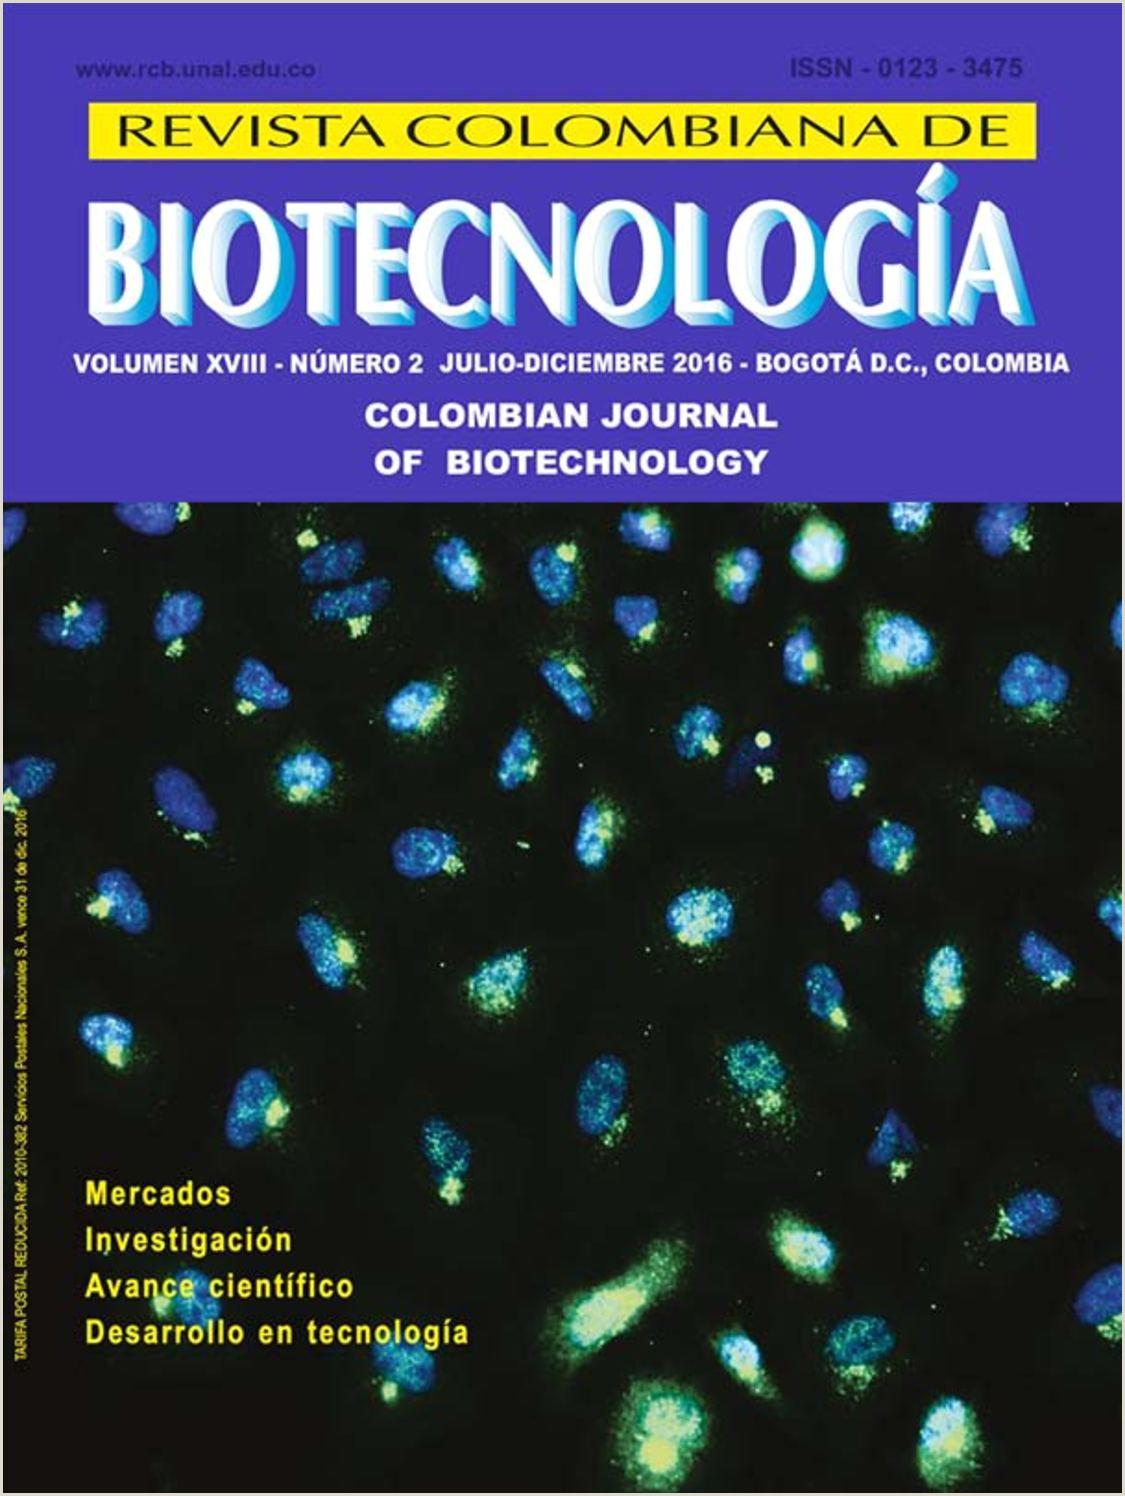 Calaméo Rev Colomb Biotecnol Vol 18 2 2016